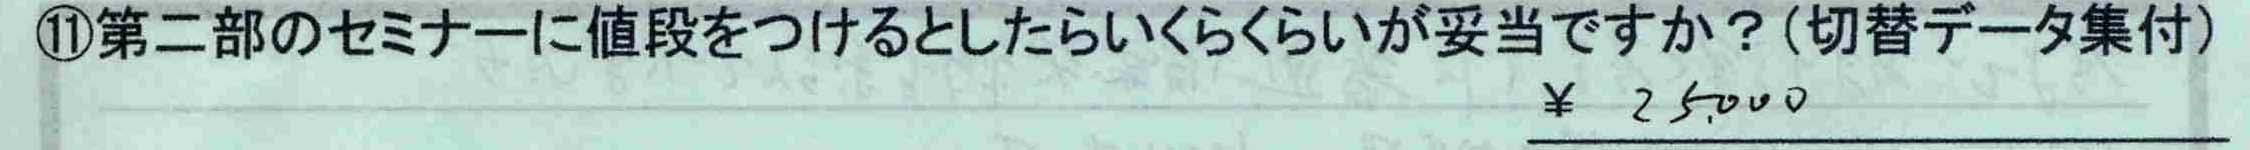 【栃木県宇都宮市】【小野智也さん】【二部価格】